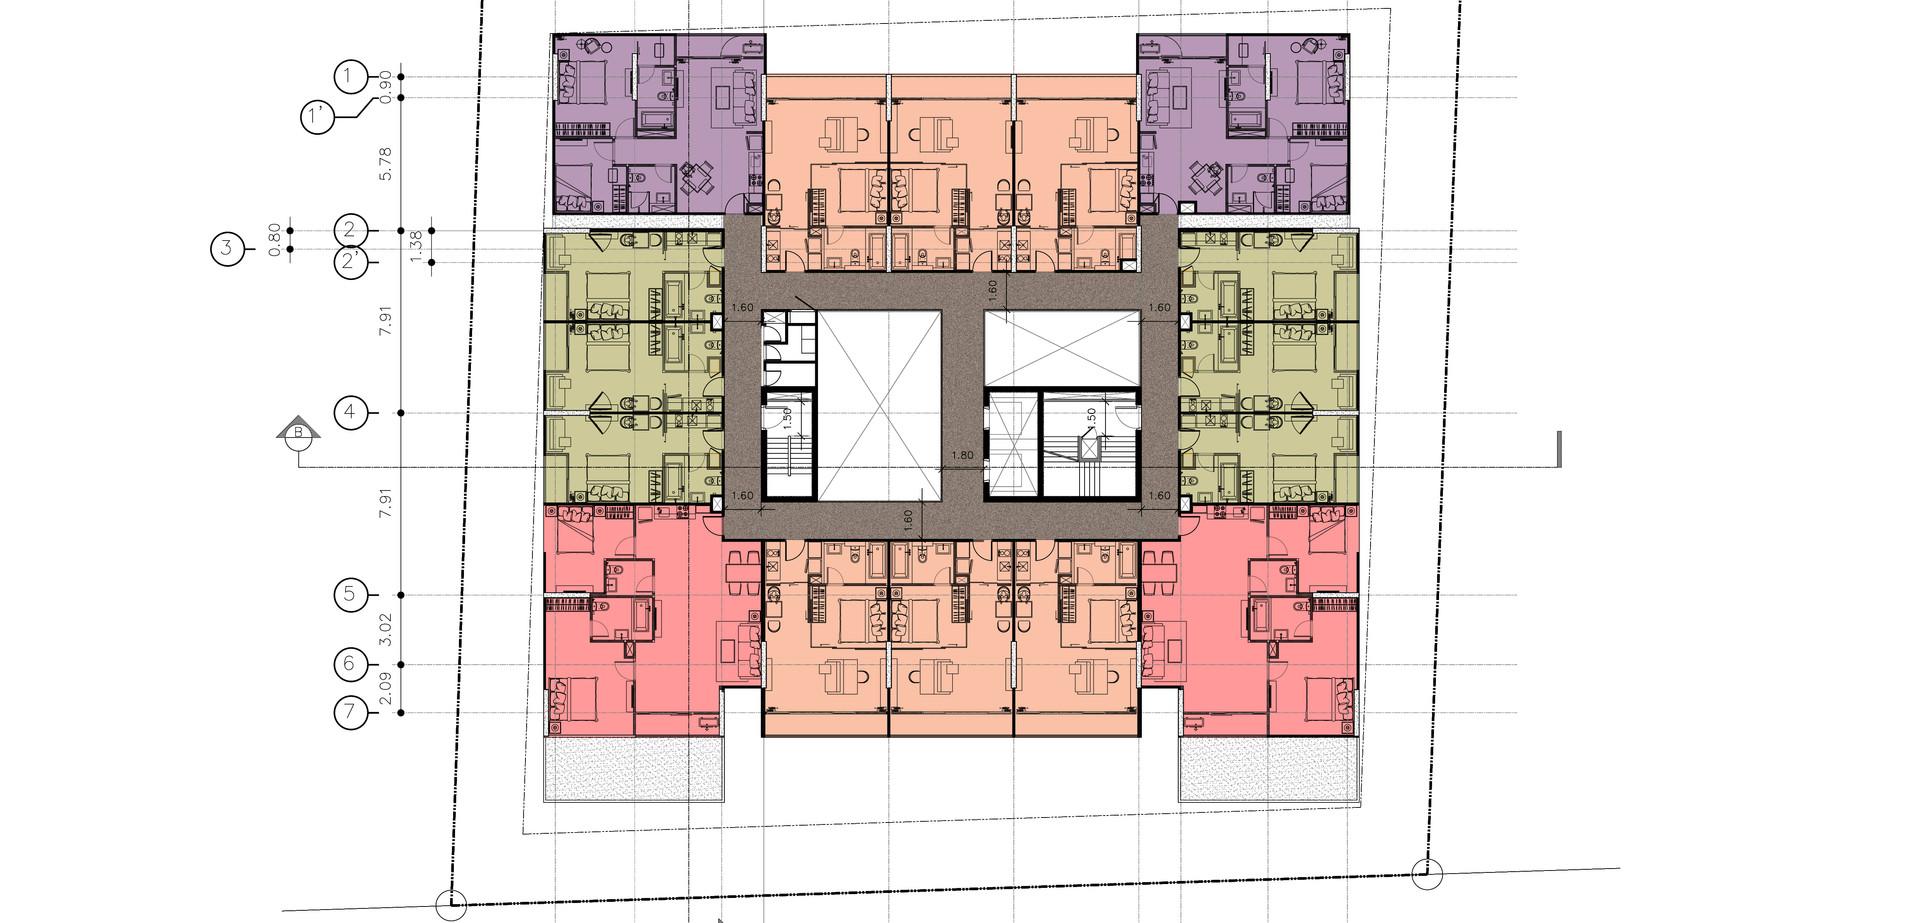 7th Floor Plan